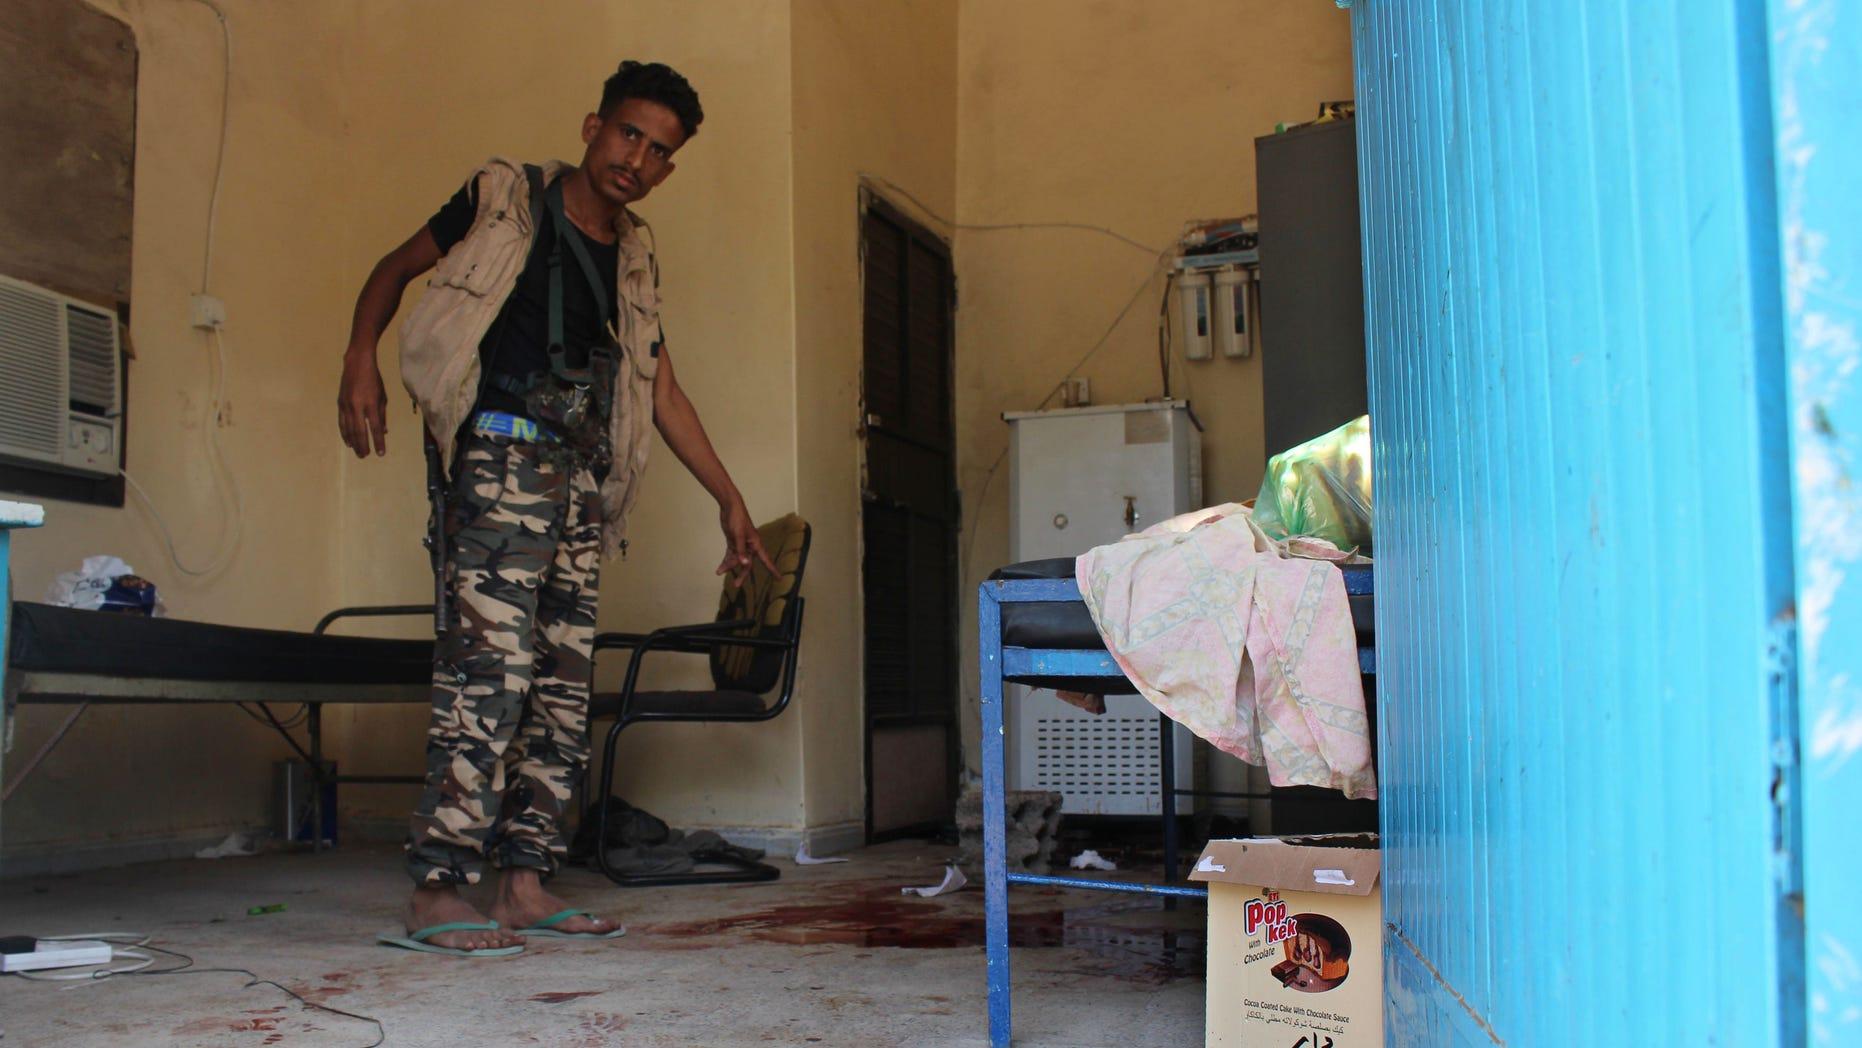 A Yemeni man inspects the scene of Friday's massacre.